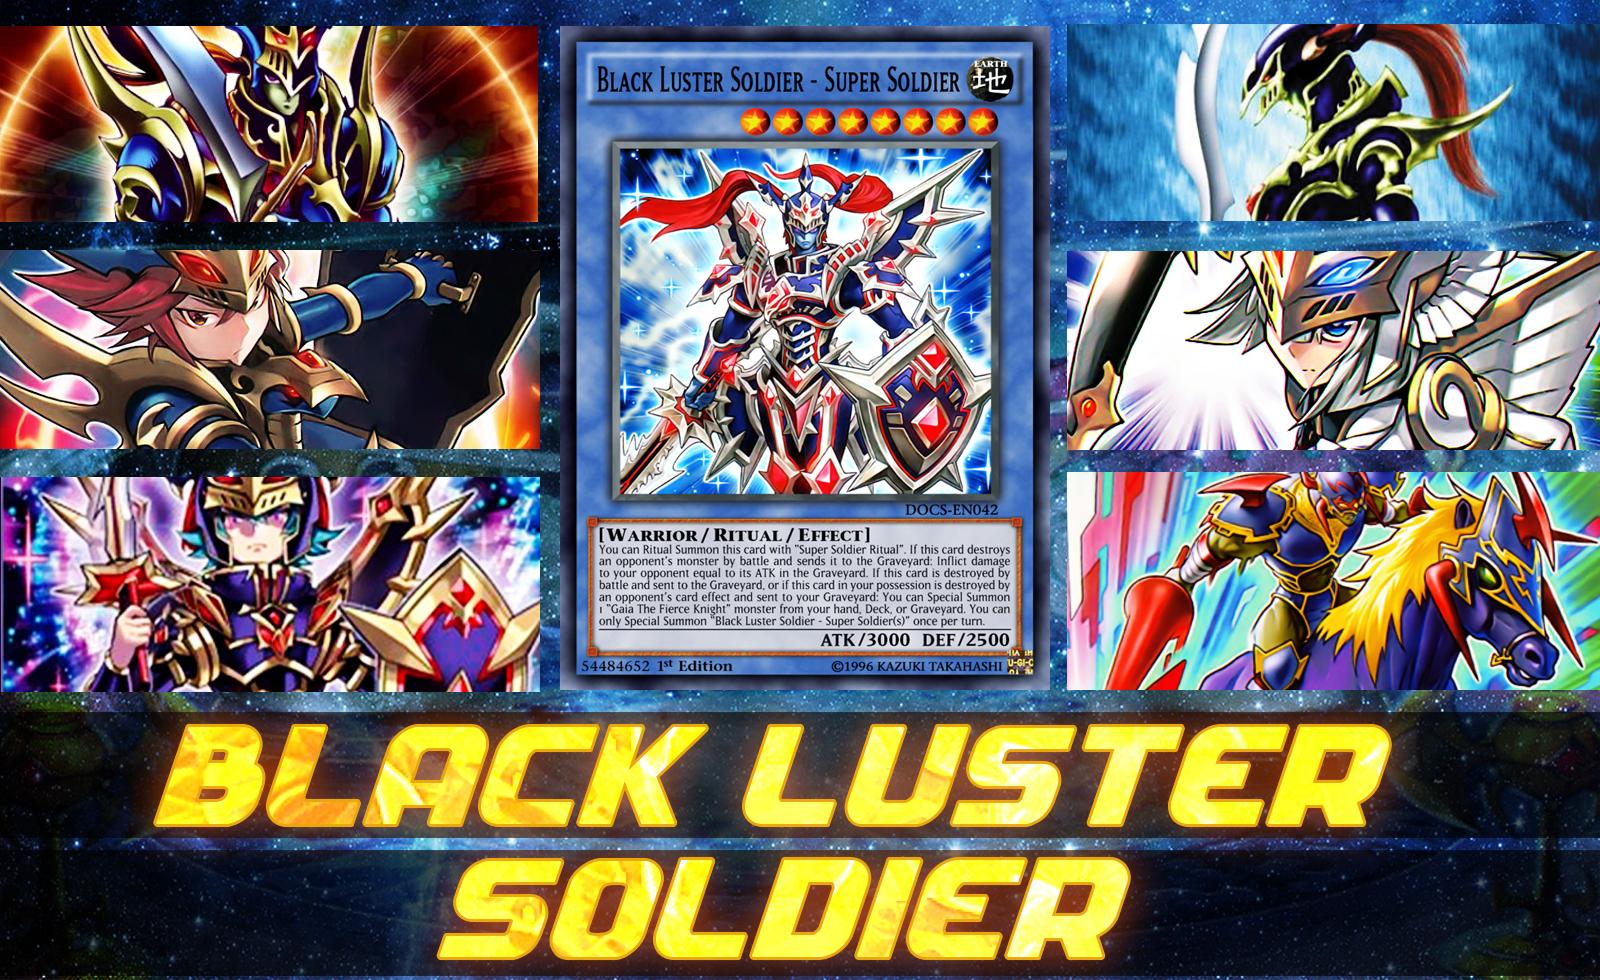 deck black luster soldier post raging tempest duel entertainment